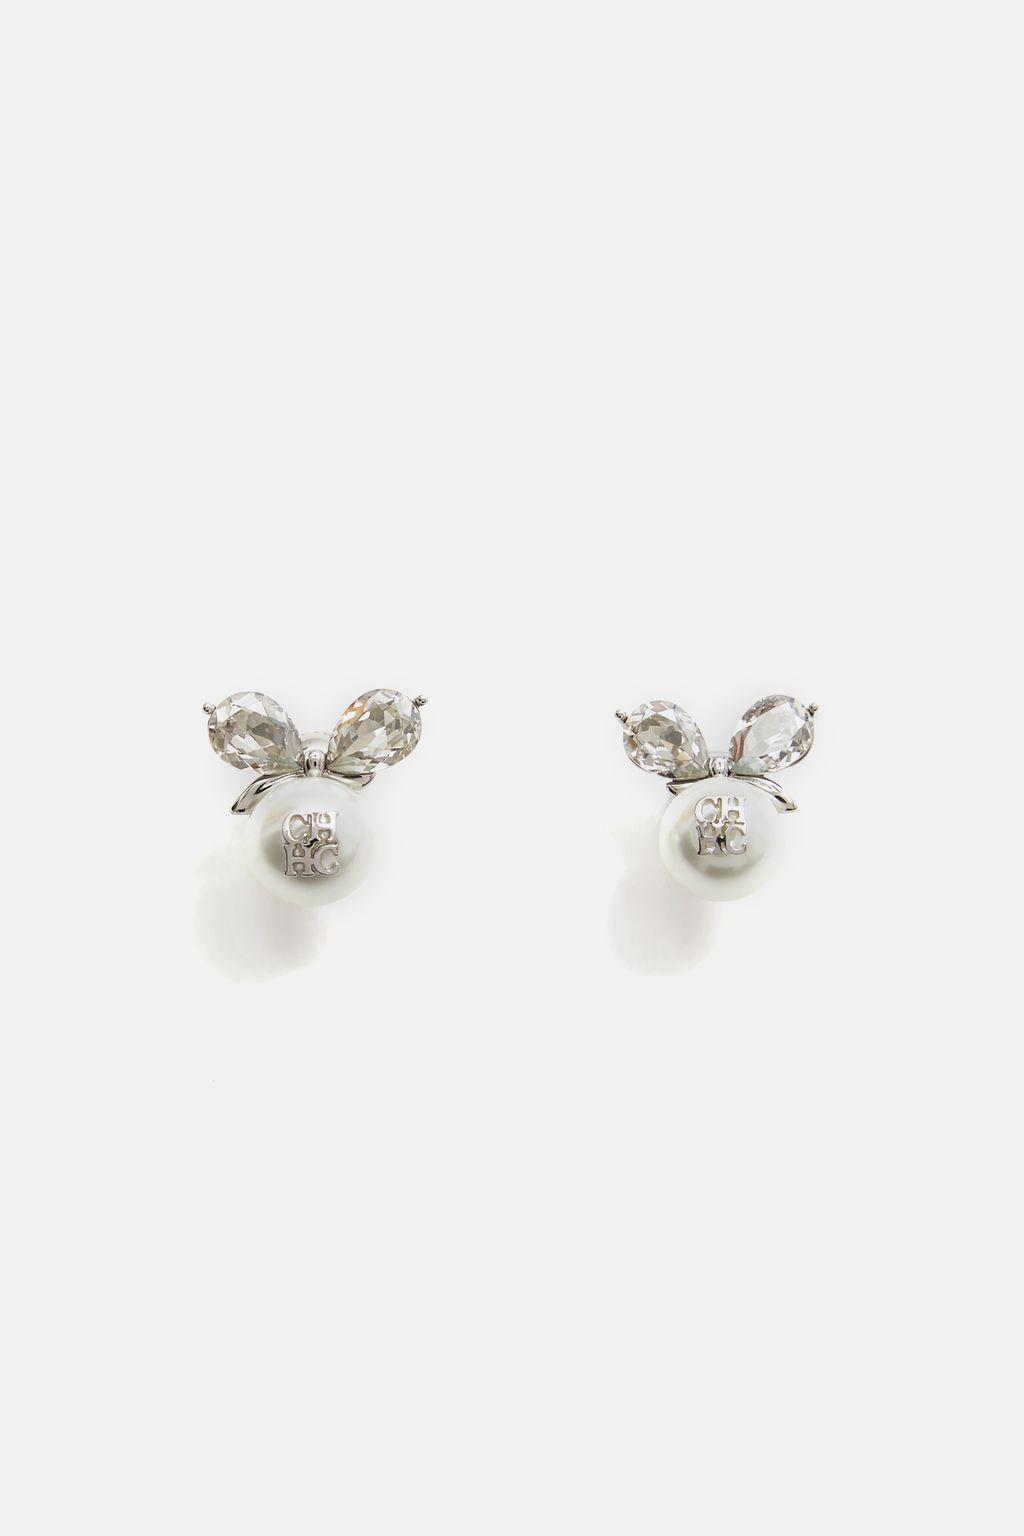 Crystal Ribbon earrings